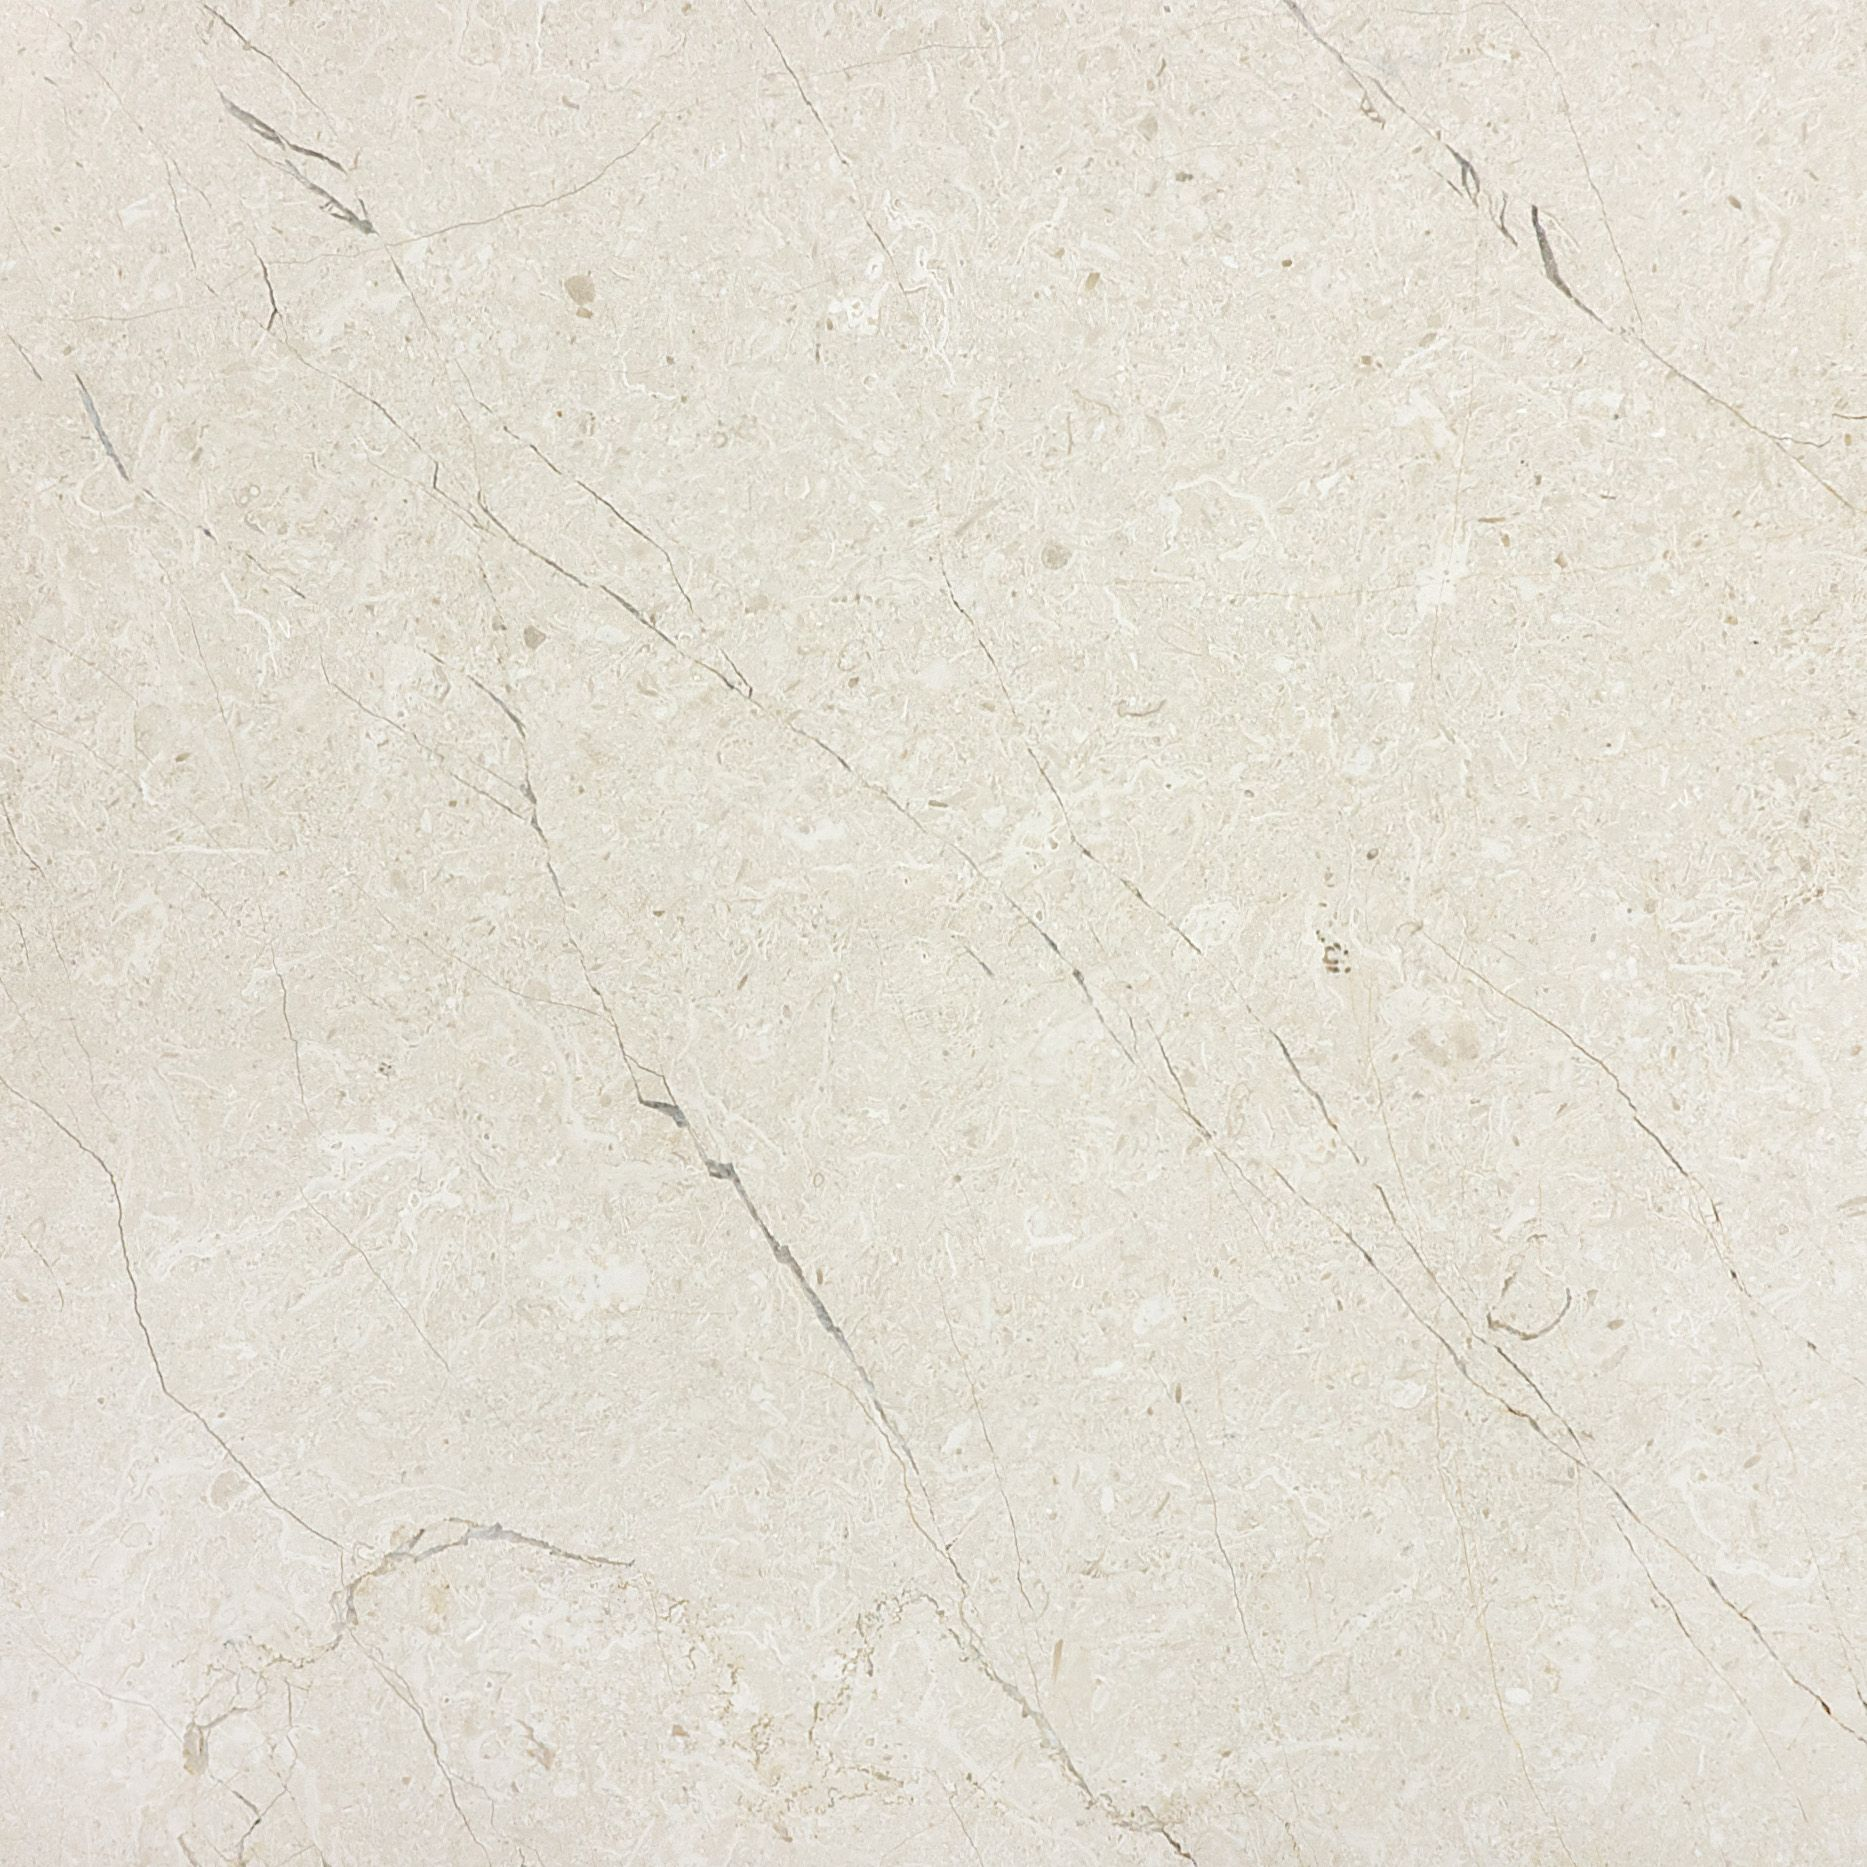 20 637 12 X12 Classic Cream Polished Marble Natural Stone Tile Www Anatoliatile Com Cream Marble Tiles Marble Tile Floor Tile Floor